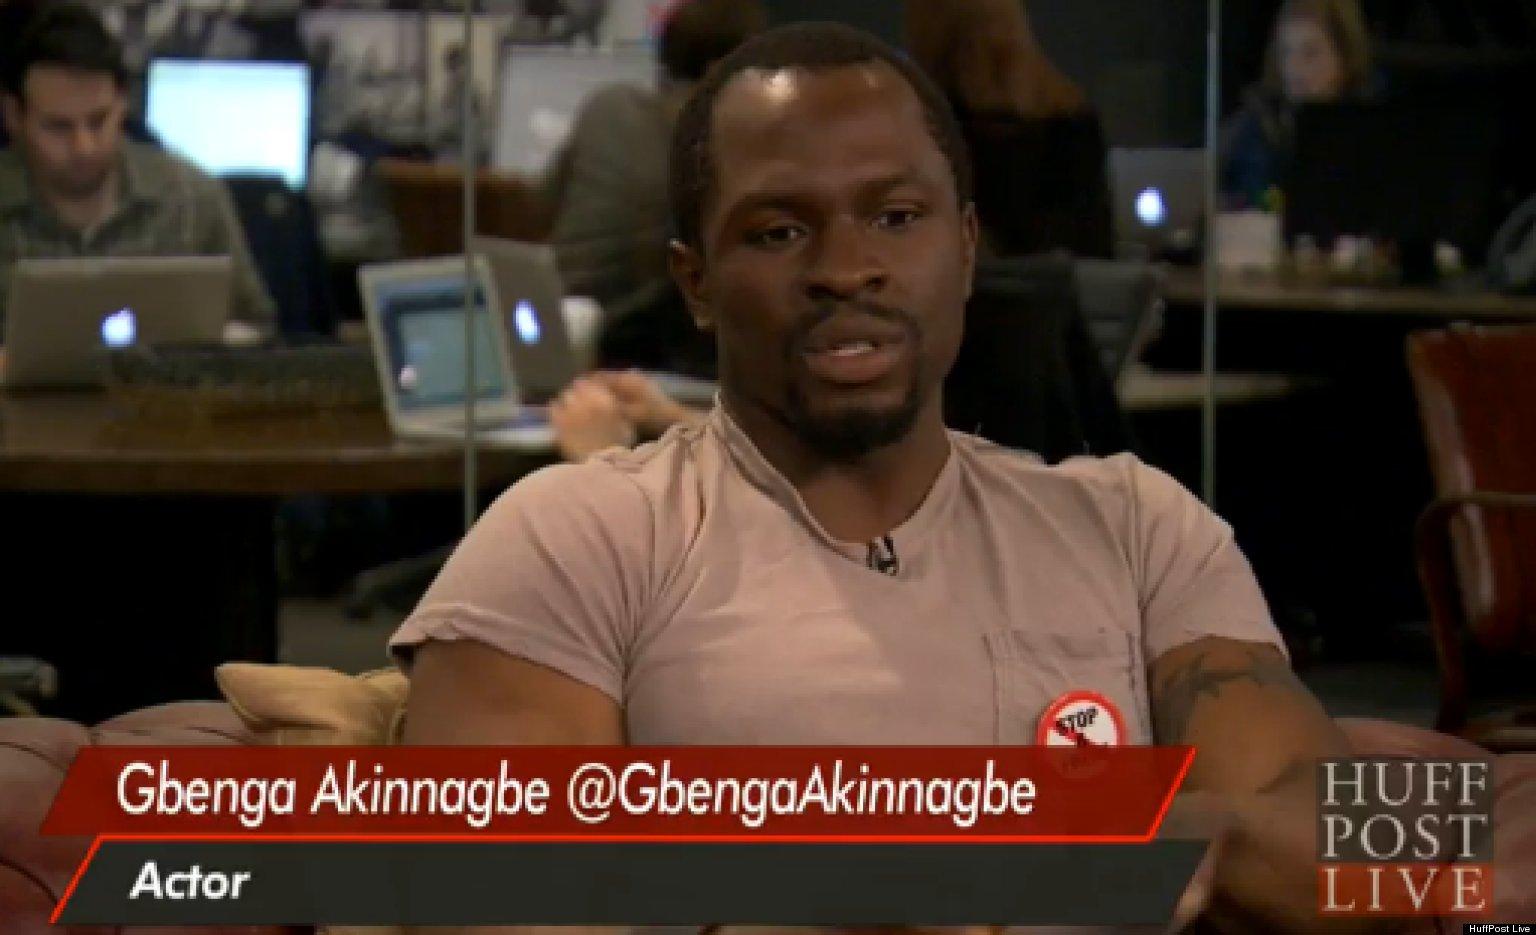 gbenga akinnagbe movies and tv shows